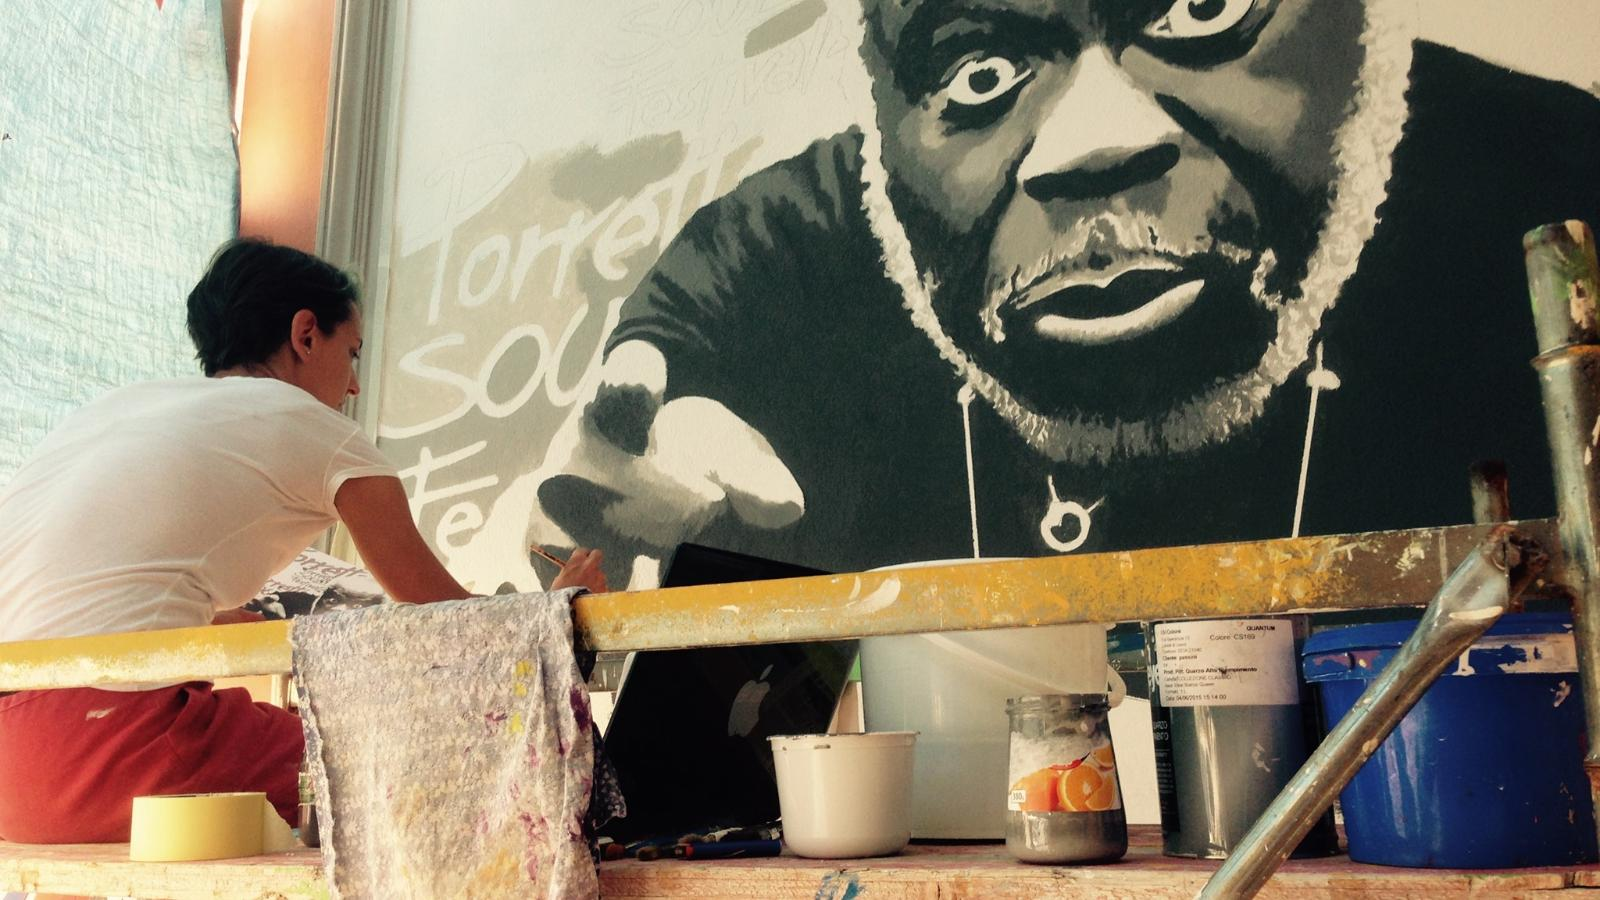 Street art Porretta Soul Festival, Archivio di porrettasoulfestival.it, CC BY NC ND 4.0